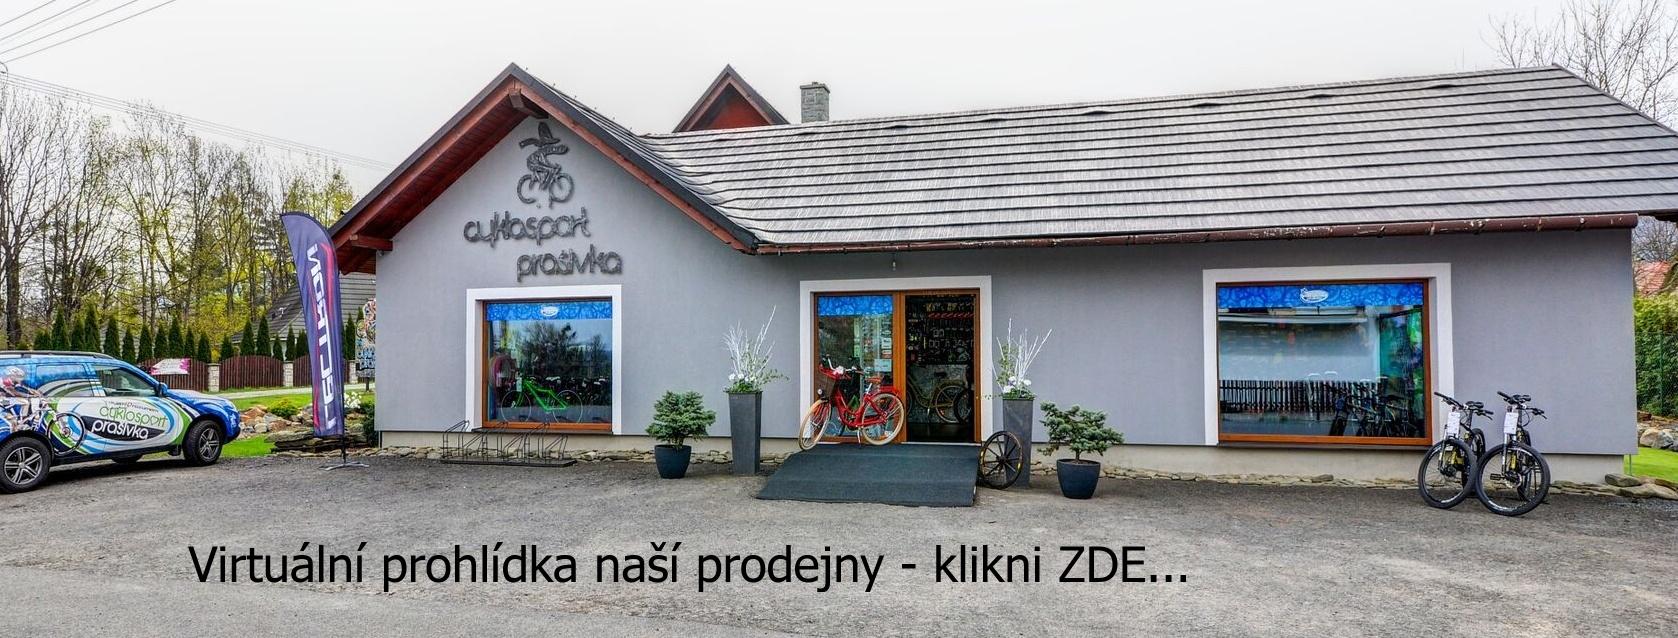 virtualni-prohlidka